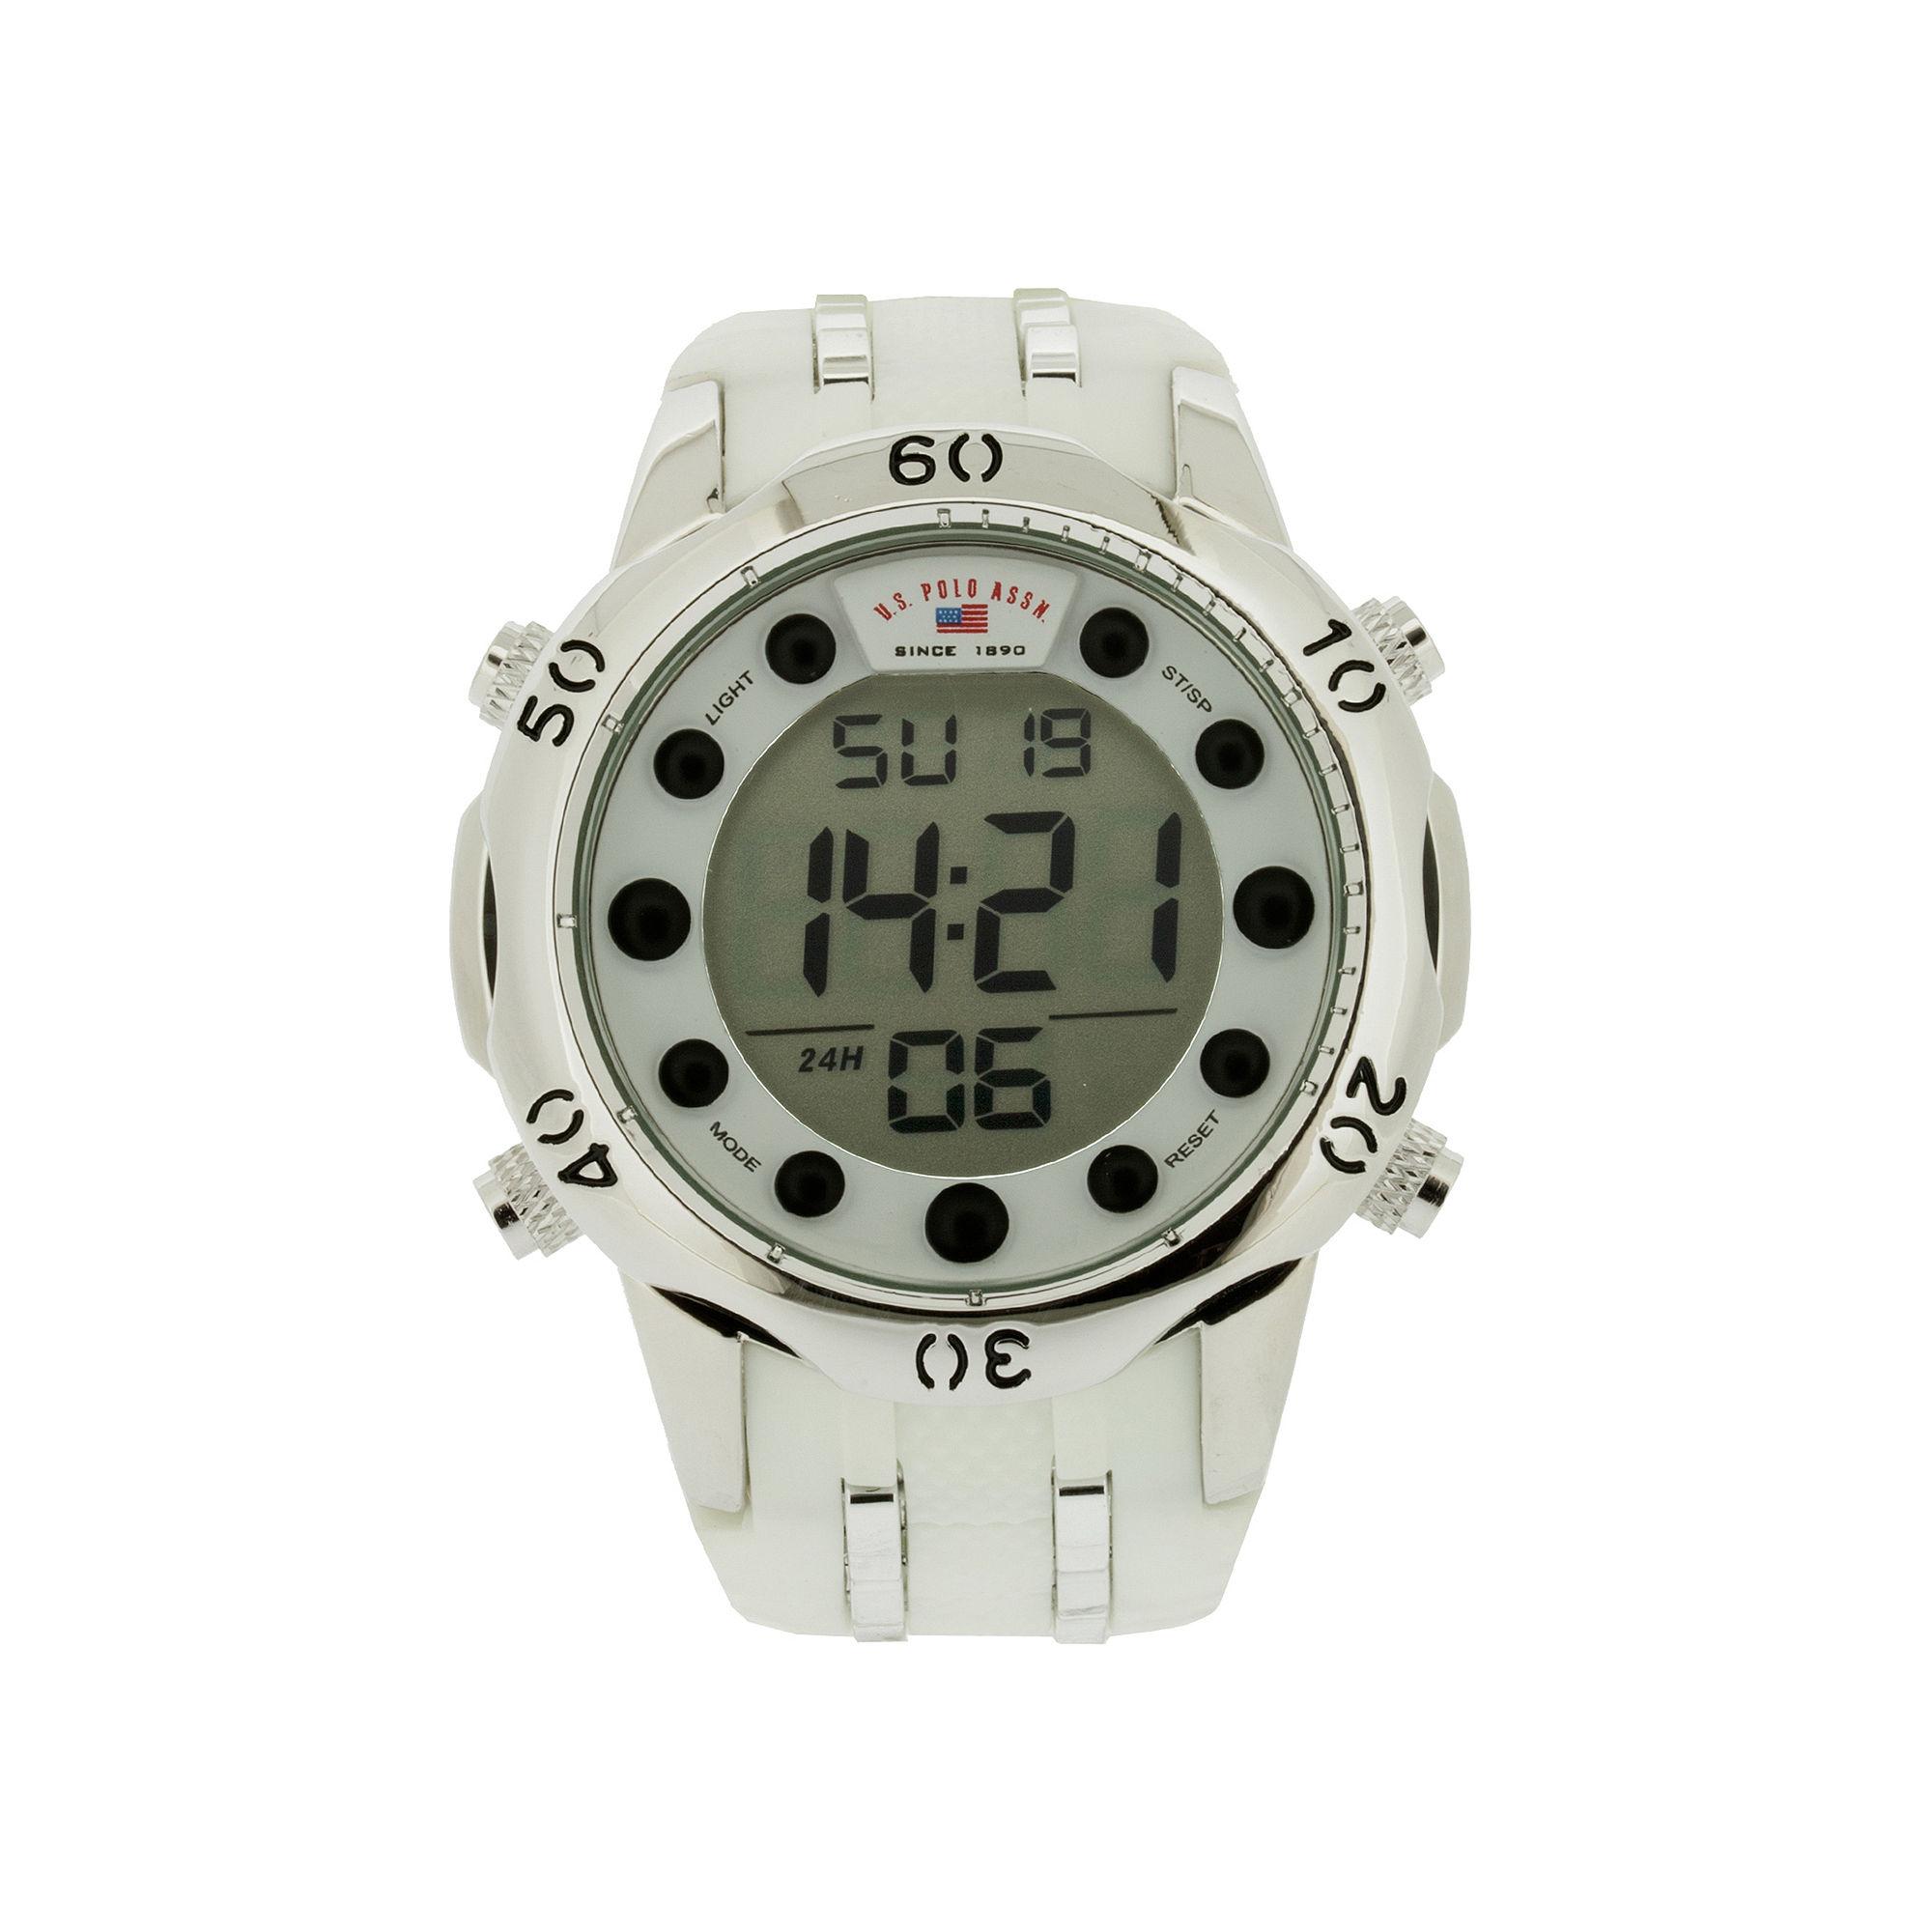 U.S. Polo Assn. Mens White Silicone Strap Digital Watch